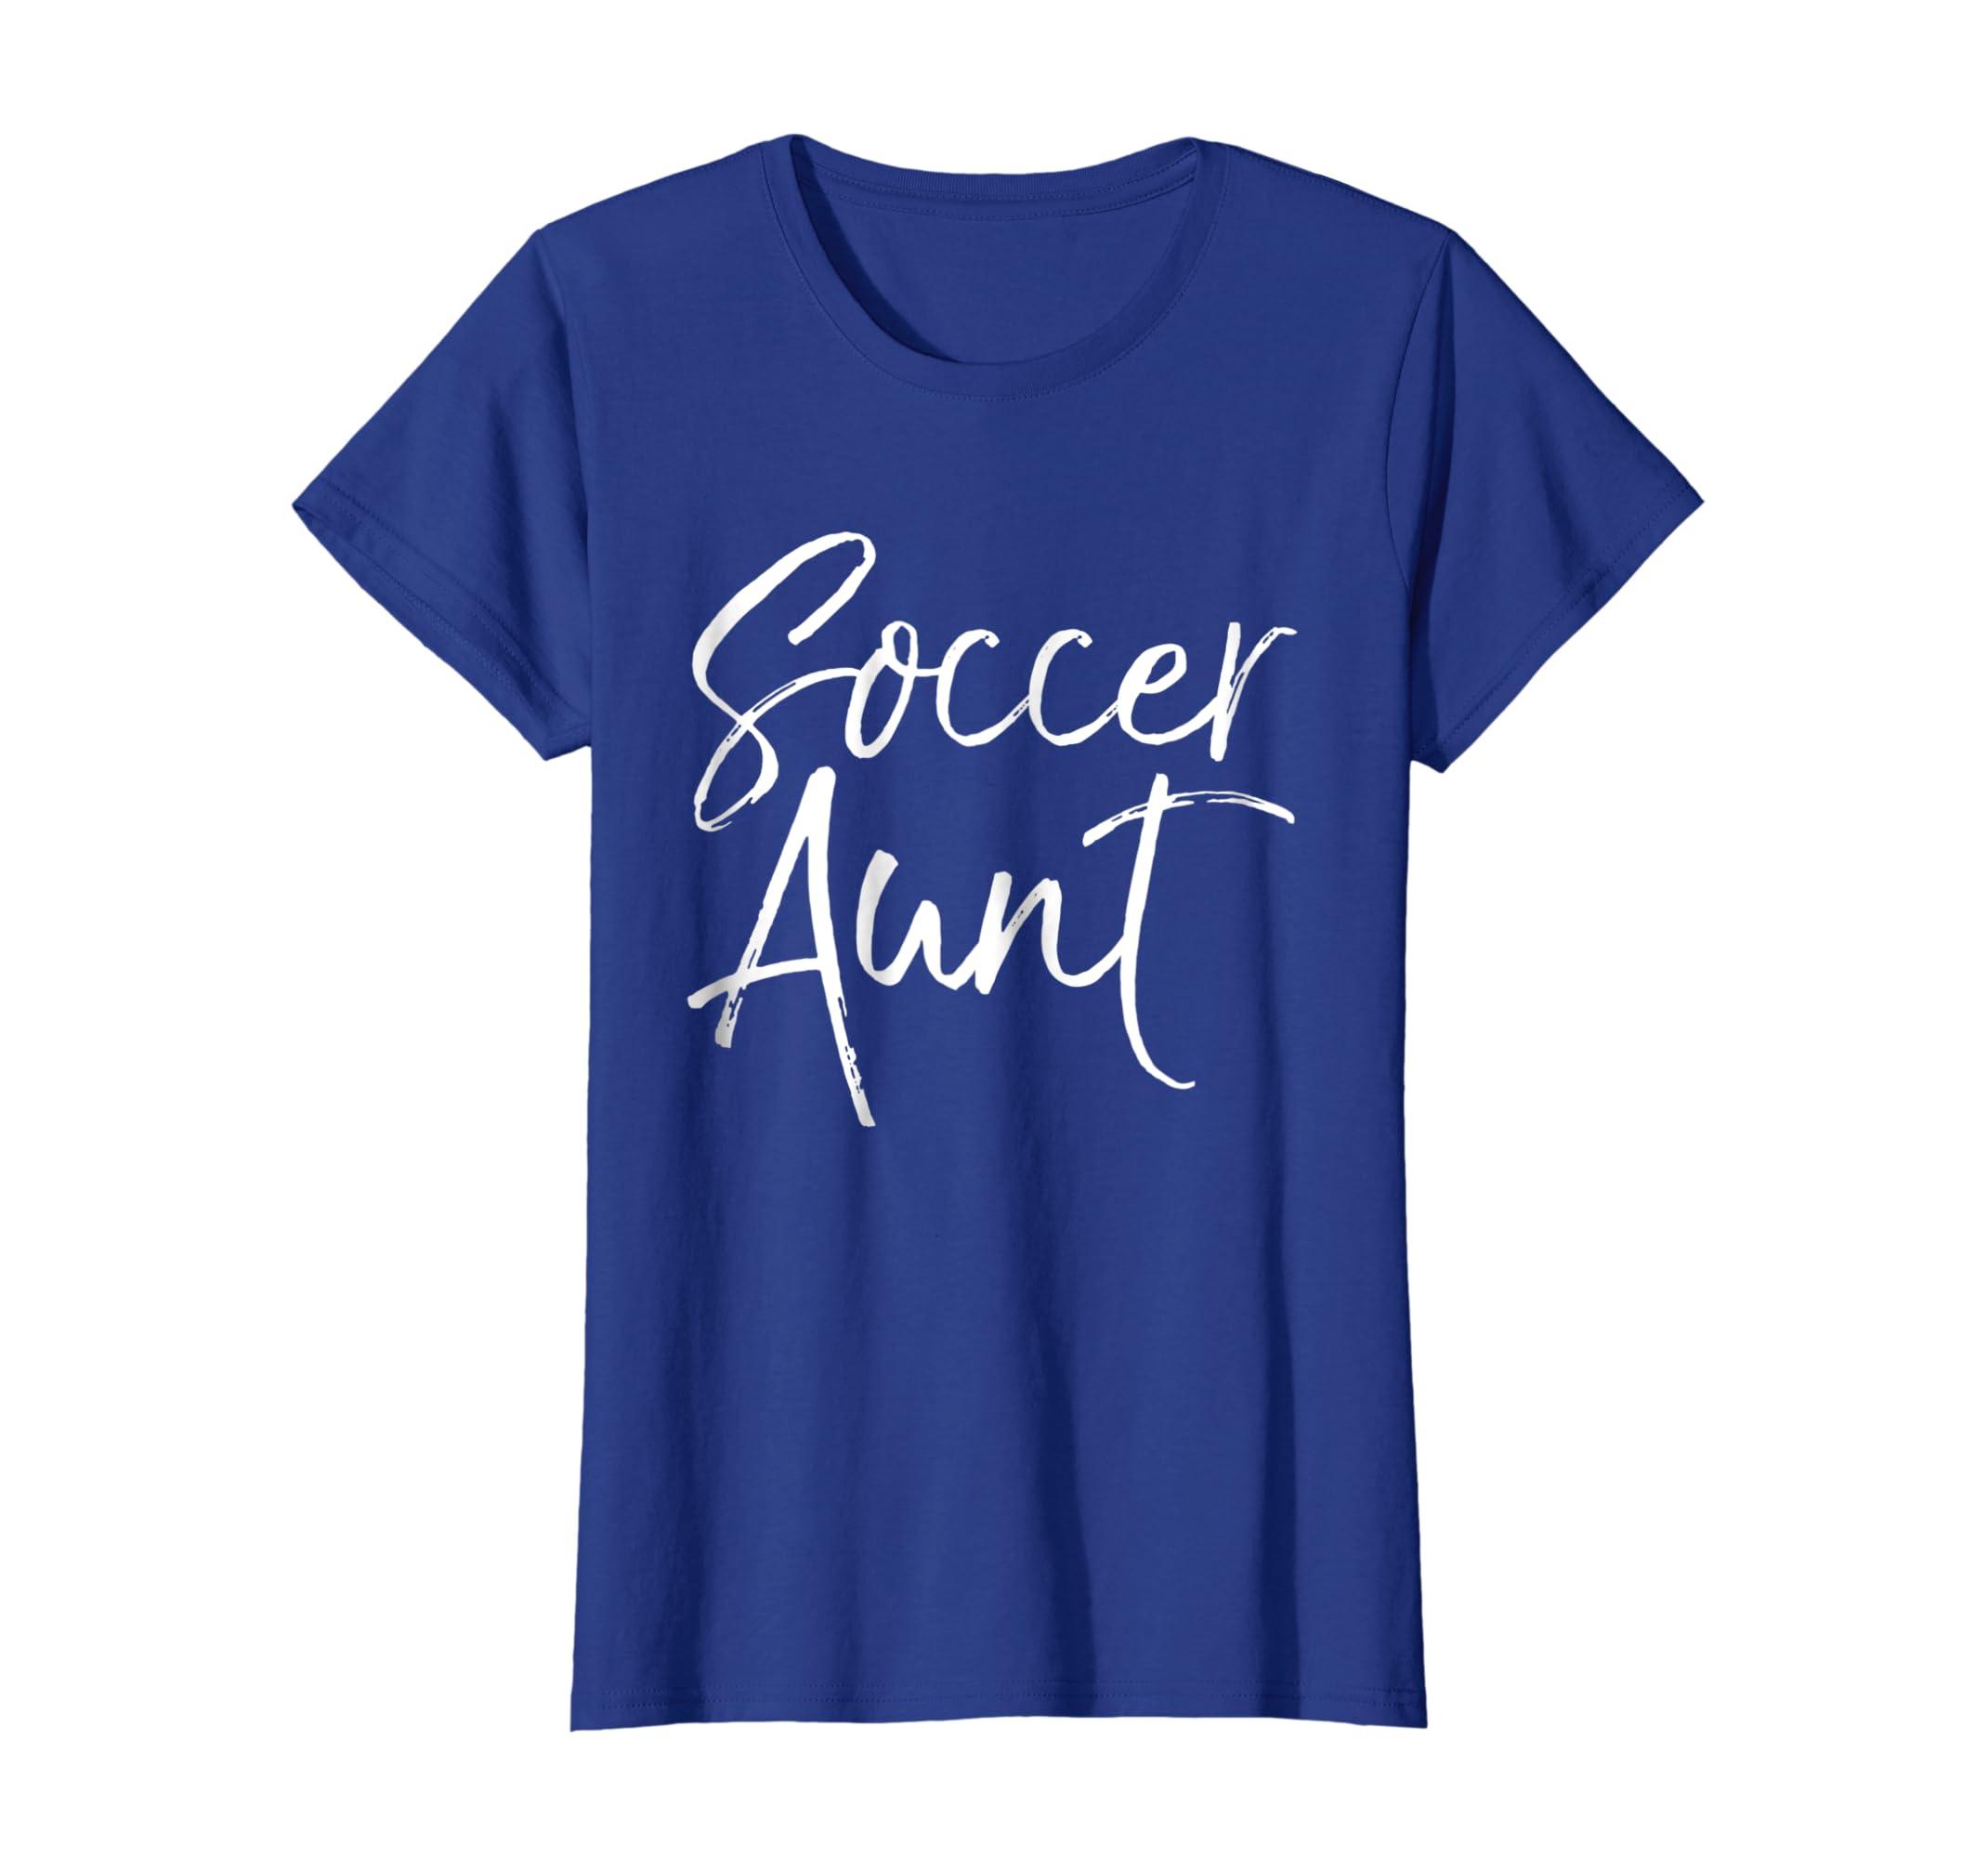 0b16bbb35bb Amazon.com: Soccer Aunt Shirt Proud Fun Cute Soccer Shirt for Auntie:  Clothing